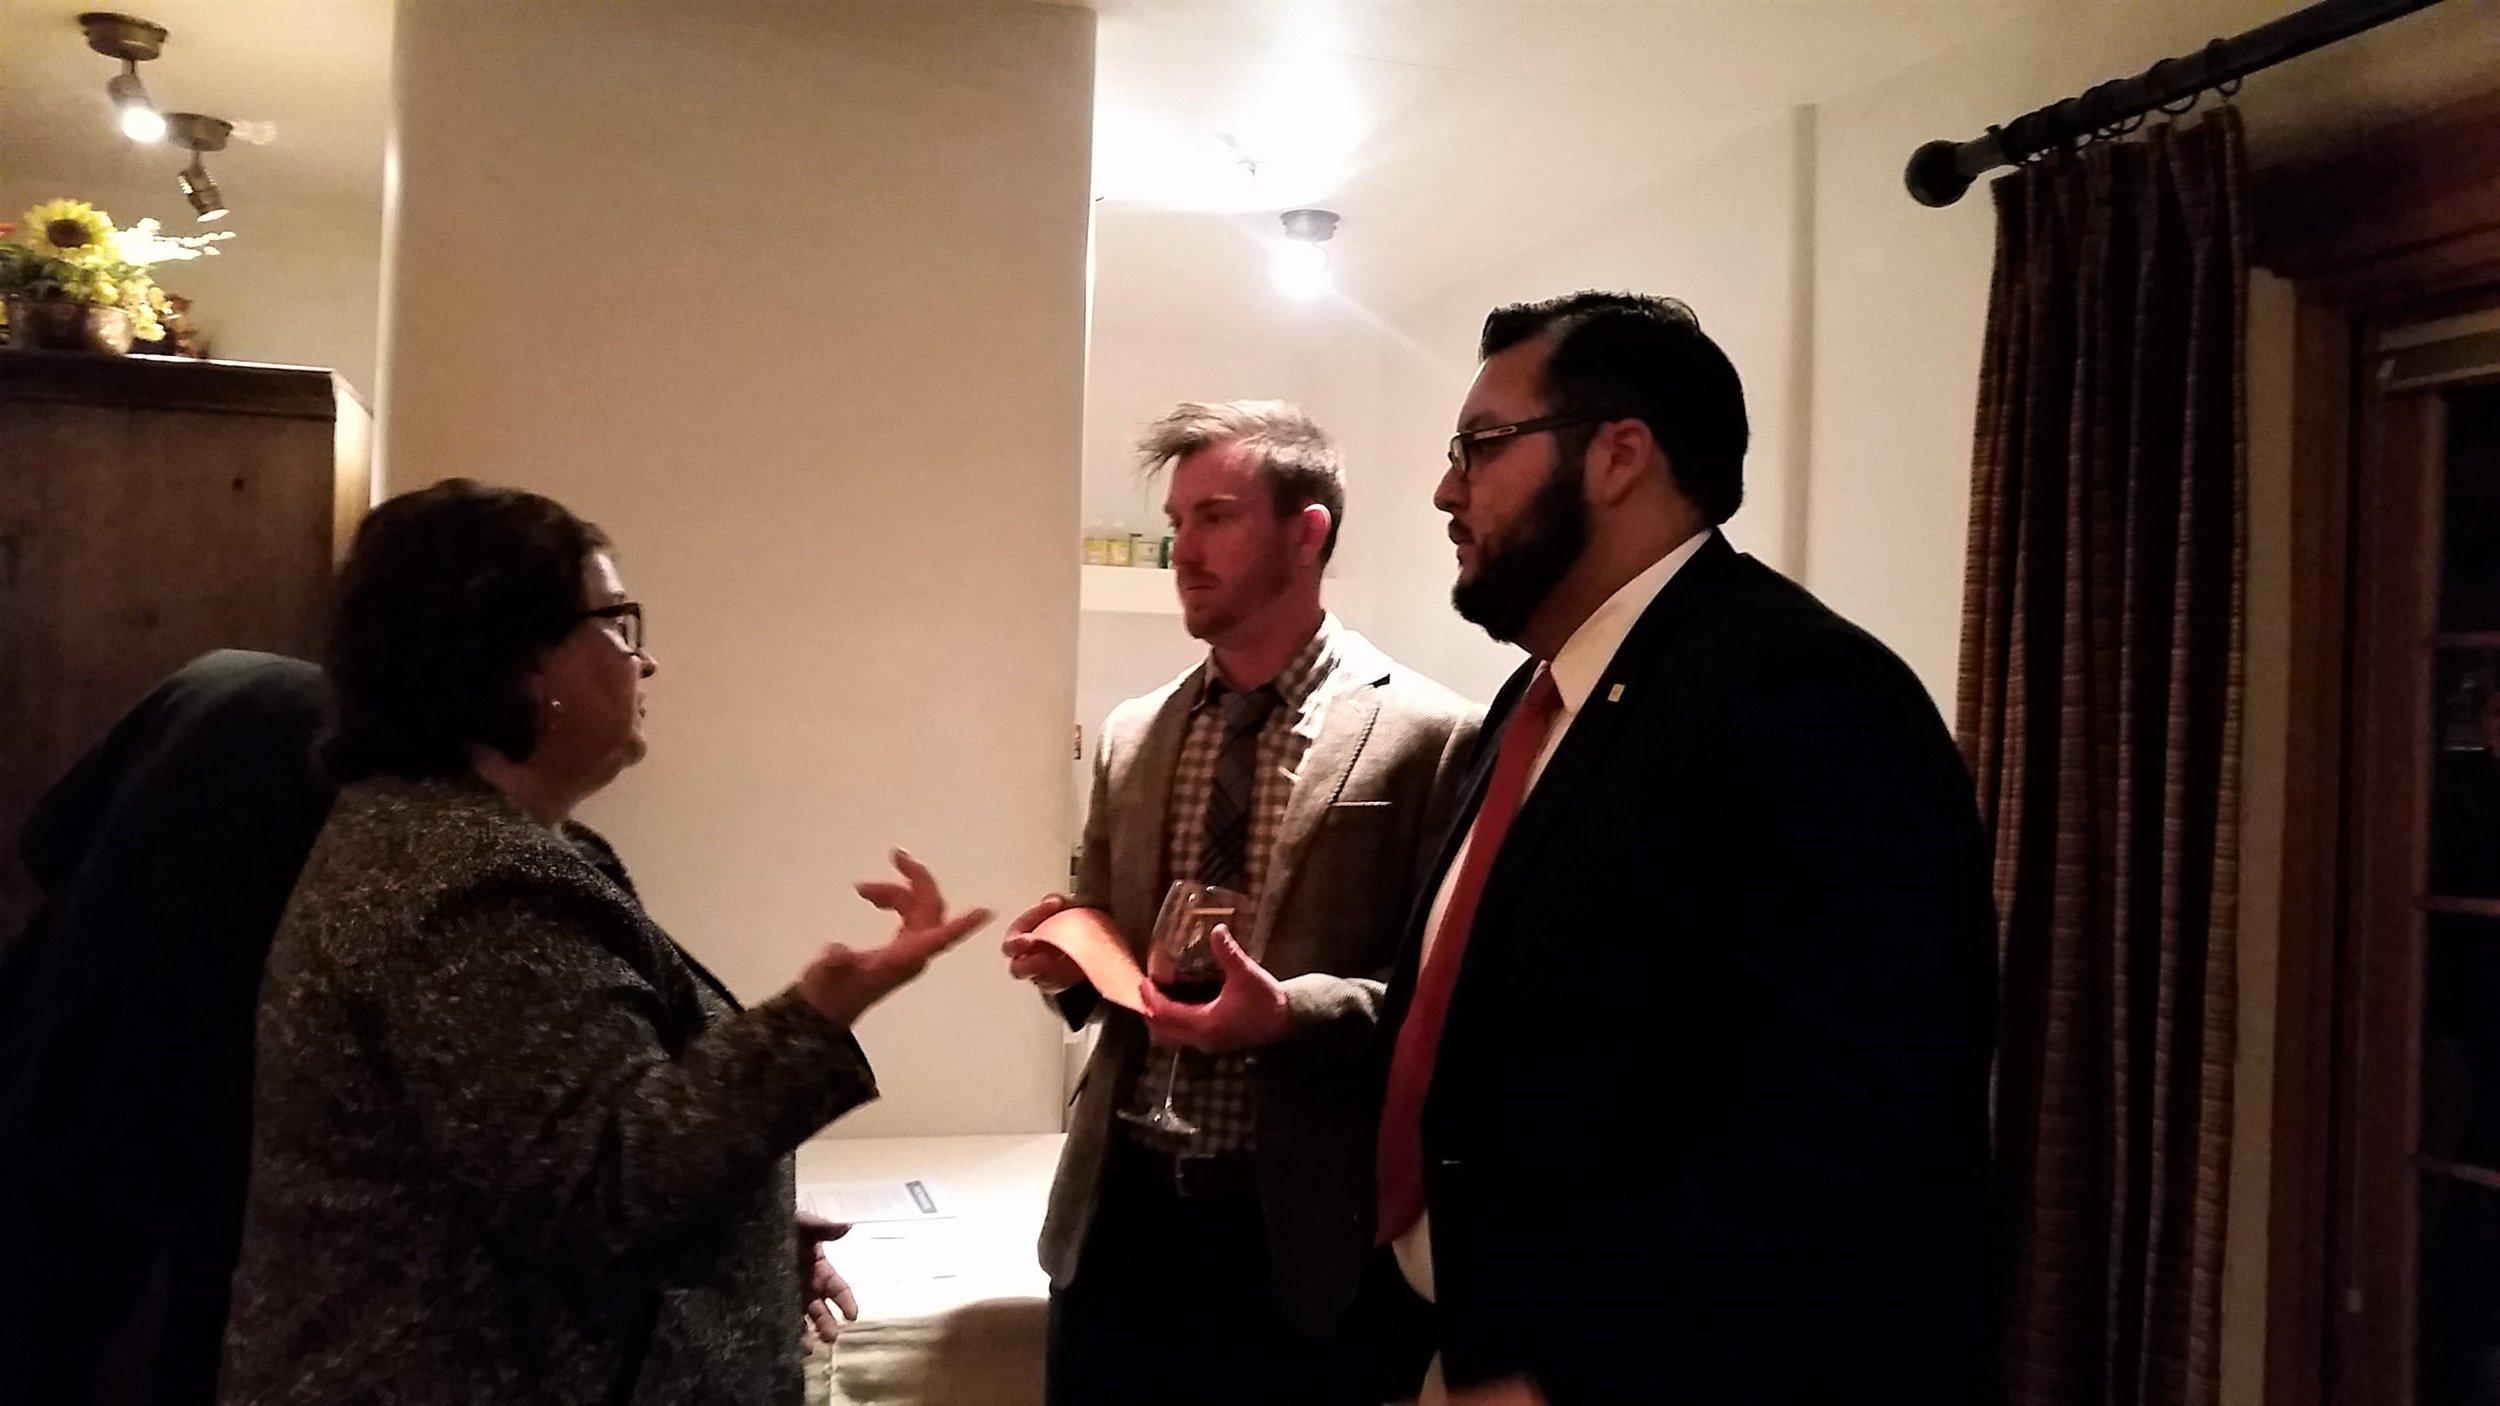 Above : Former Health Secretary under Governor Bill Richardson, Patricia Montoya talking with students in the MHA program, Stetson Berg and David Medrano